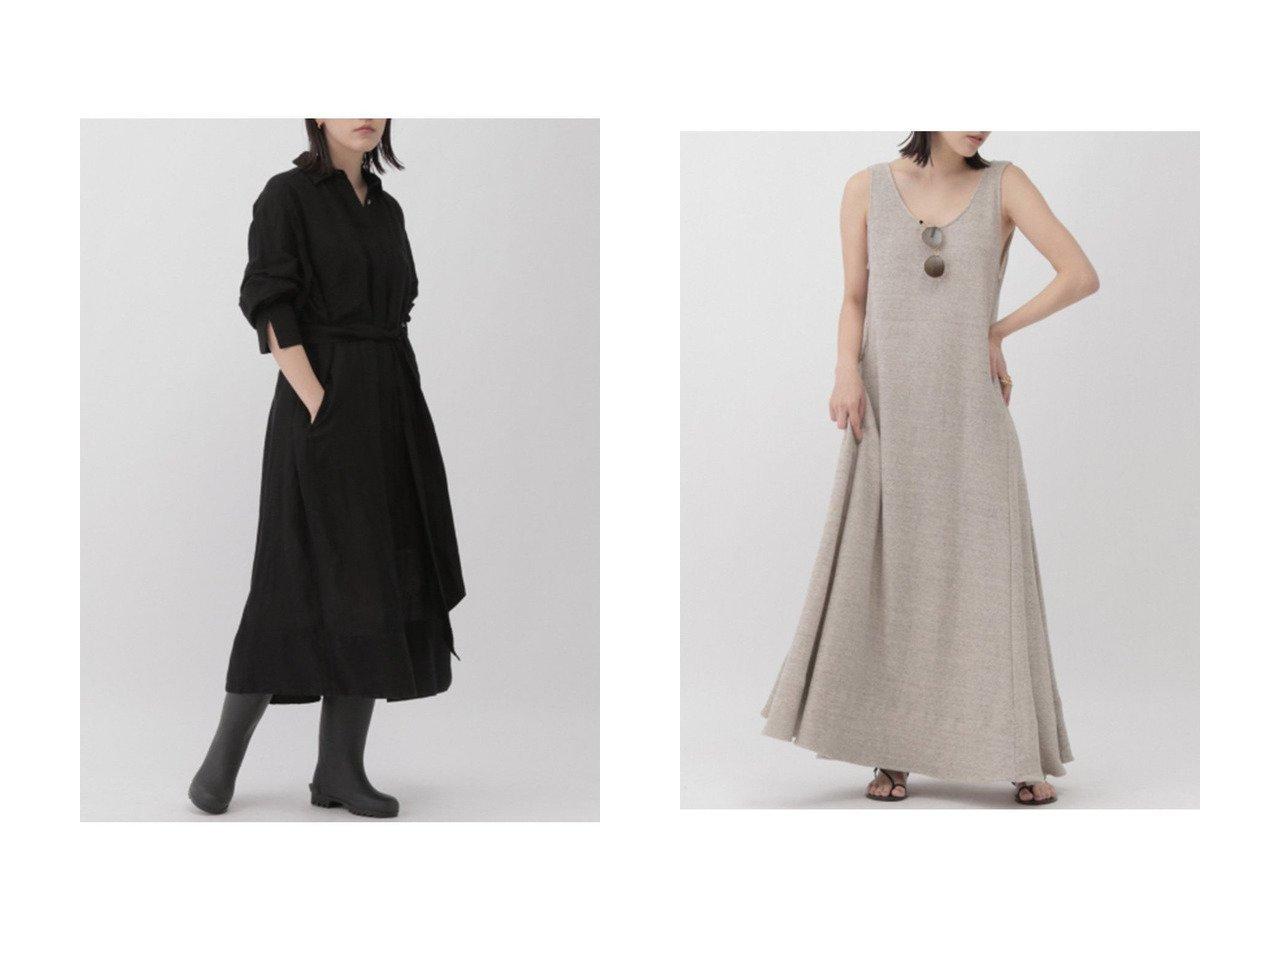 【Chaos/カオス】のガーランドシャツワンピース&ハニカムイージードレス 【ワンピース・ドレス】おすすめ!人気、トレンド・レディースファッションの通販 おすすめで人気の流行・トレンド、ファッションの通販商品 メンズファッション・キッズファッション・インテリア・家具・レディースファッション・服の通販 founy(ファニー) https://founy.com/ ファッション Fashion レディースファッション WOMEN ワンピース Dress ドレス Party Dresses シャツワンピース Shirt Dresses カットソー ロング インド フランス ラグジュアリー リネン 羽織 |ID:crp329100000029848